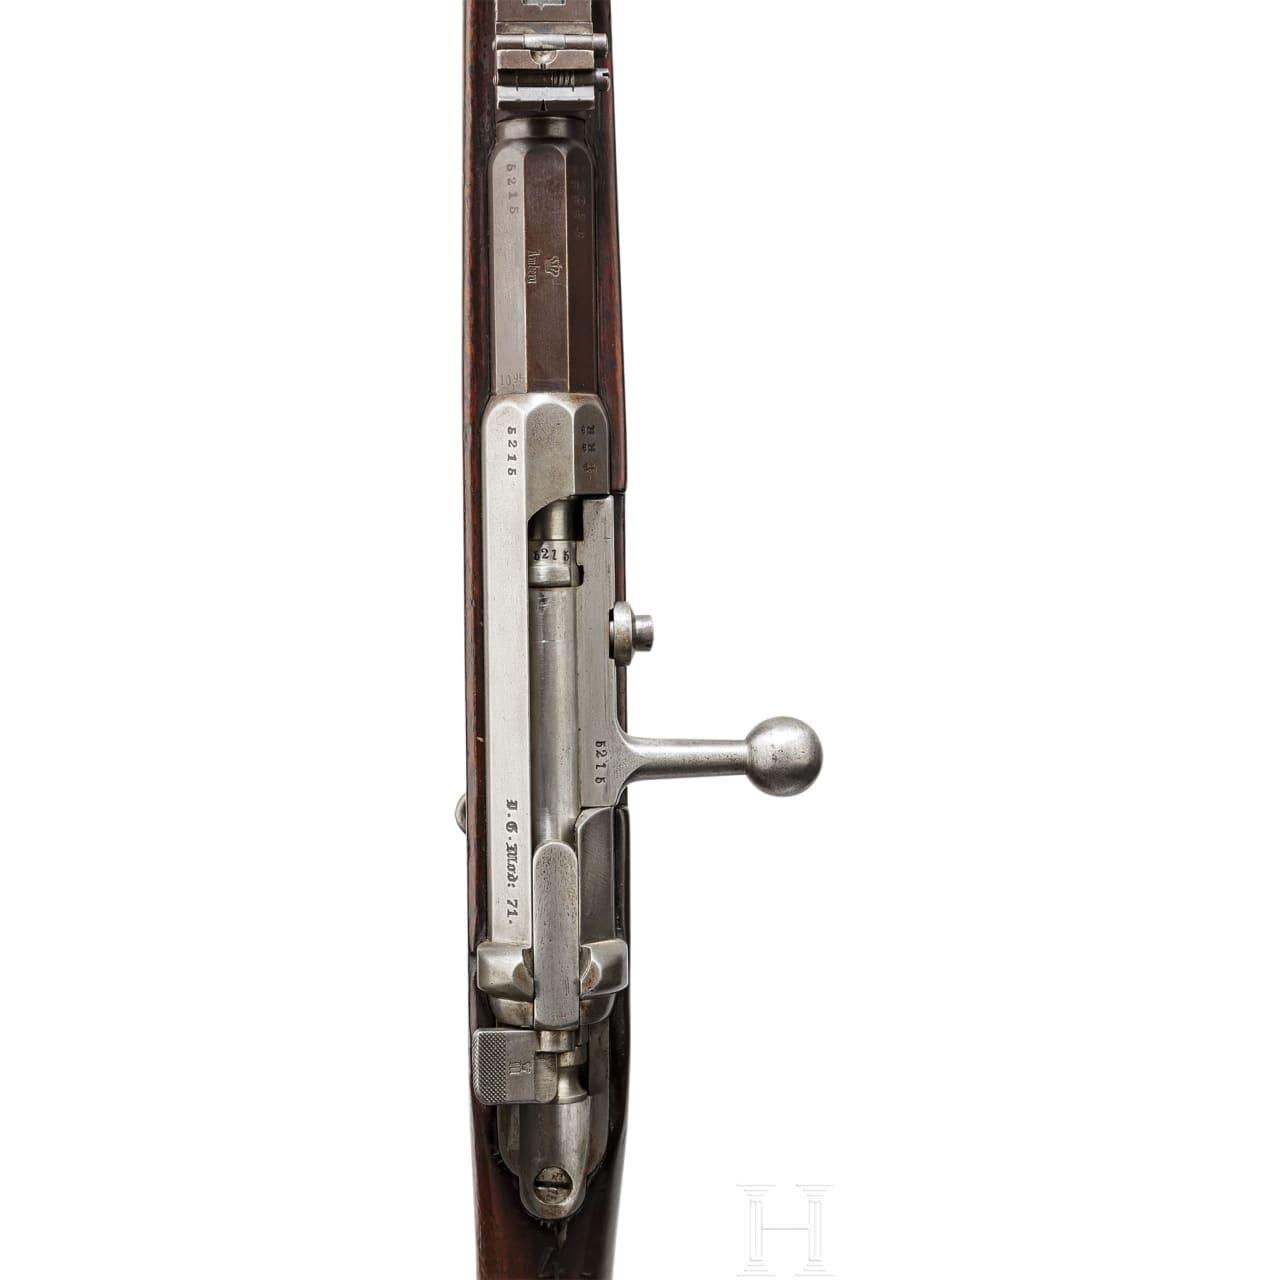 An Infantry Rifle M 1871, Amberg